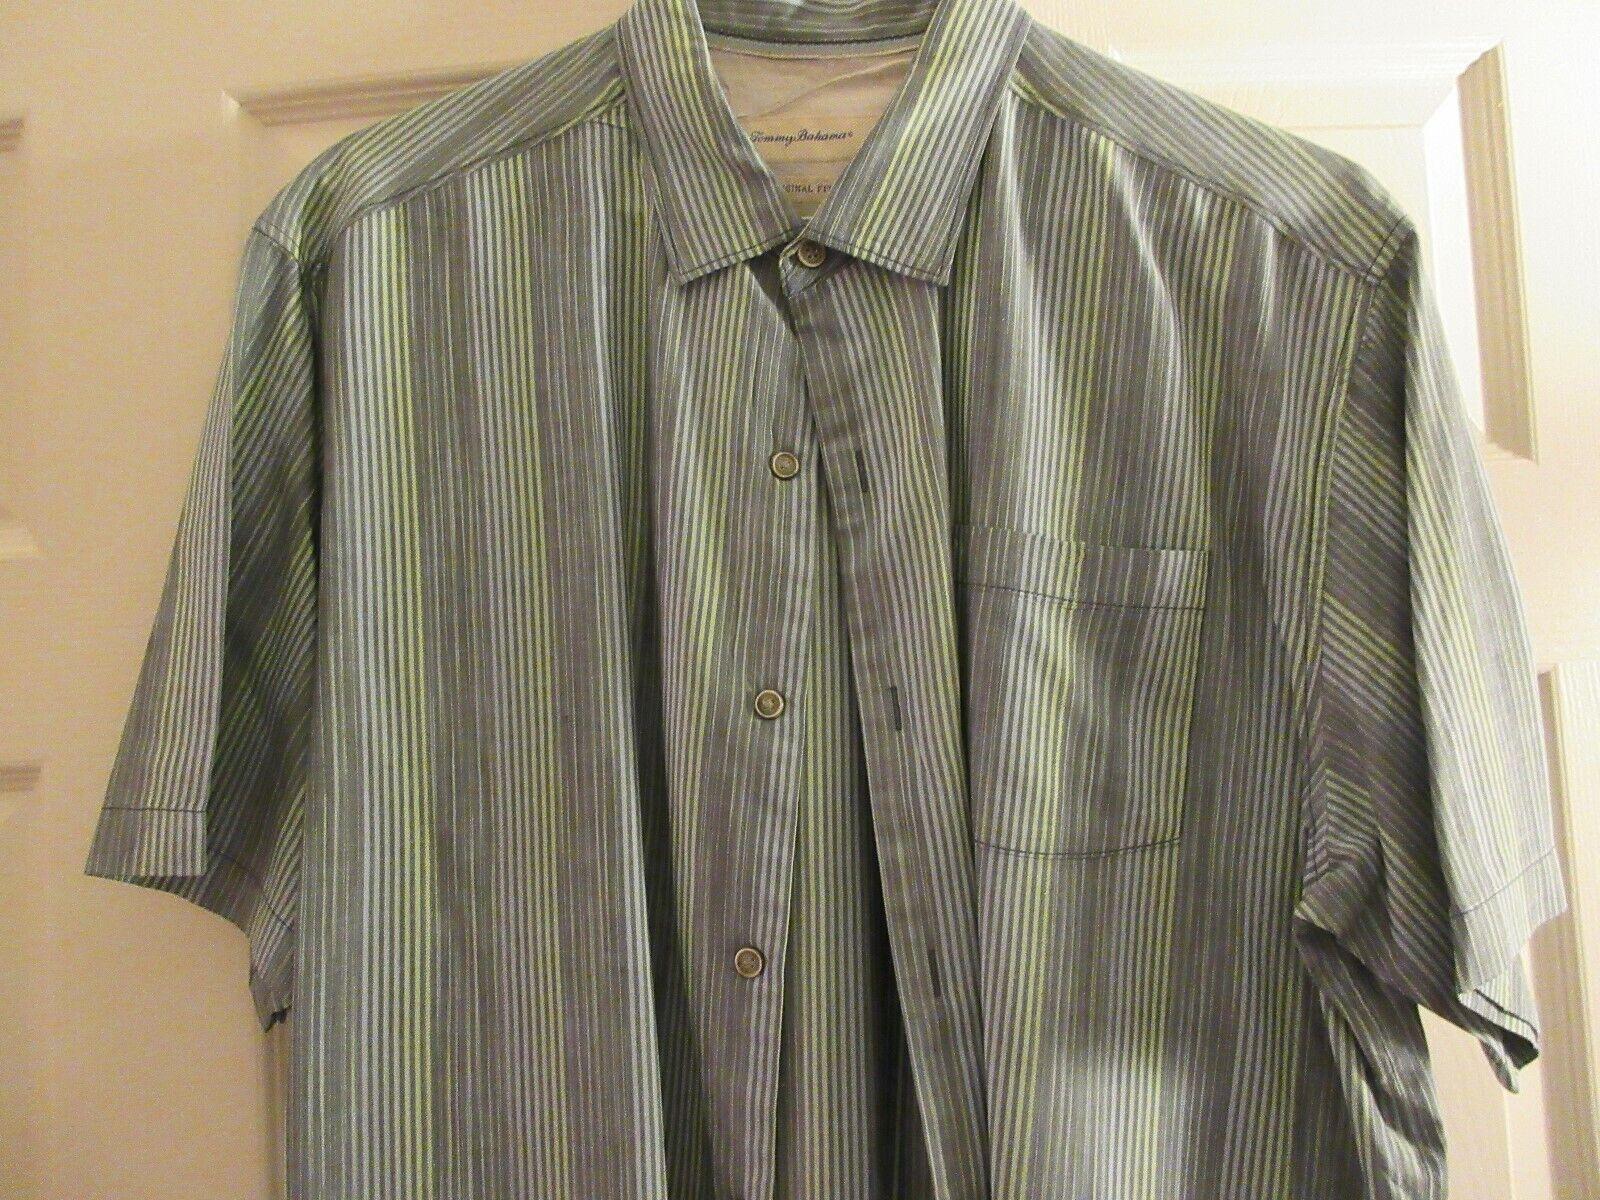 Tommy Bahama Original Fit , Men's Short Sleeve , XL/TG